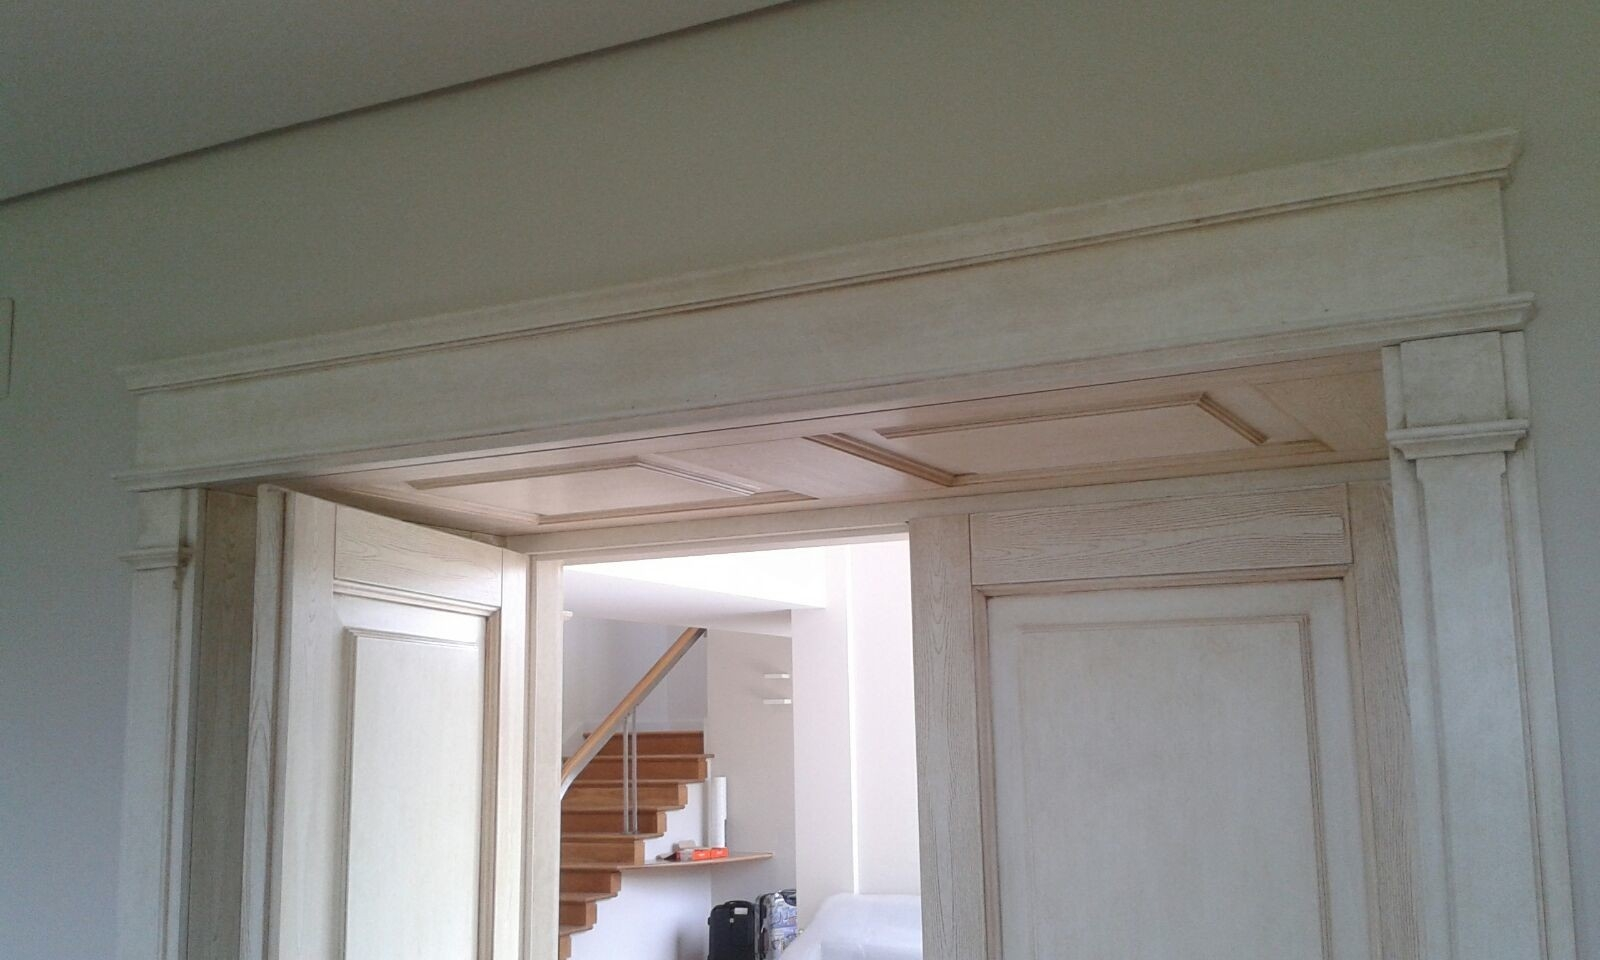 Timberplan obra residencial vivienda Getxo 2 1600x960 c